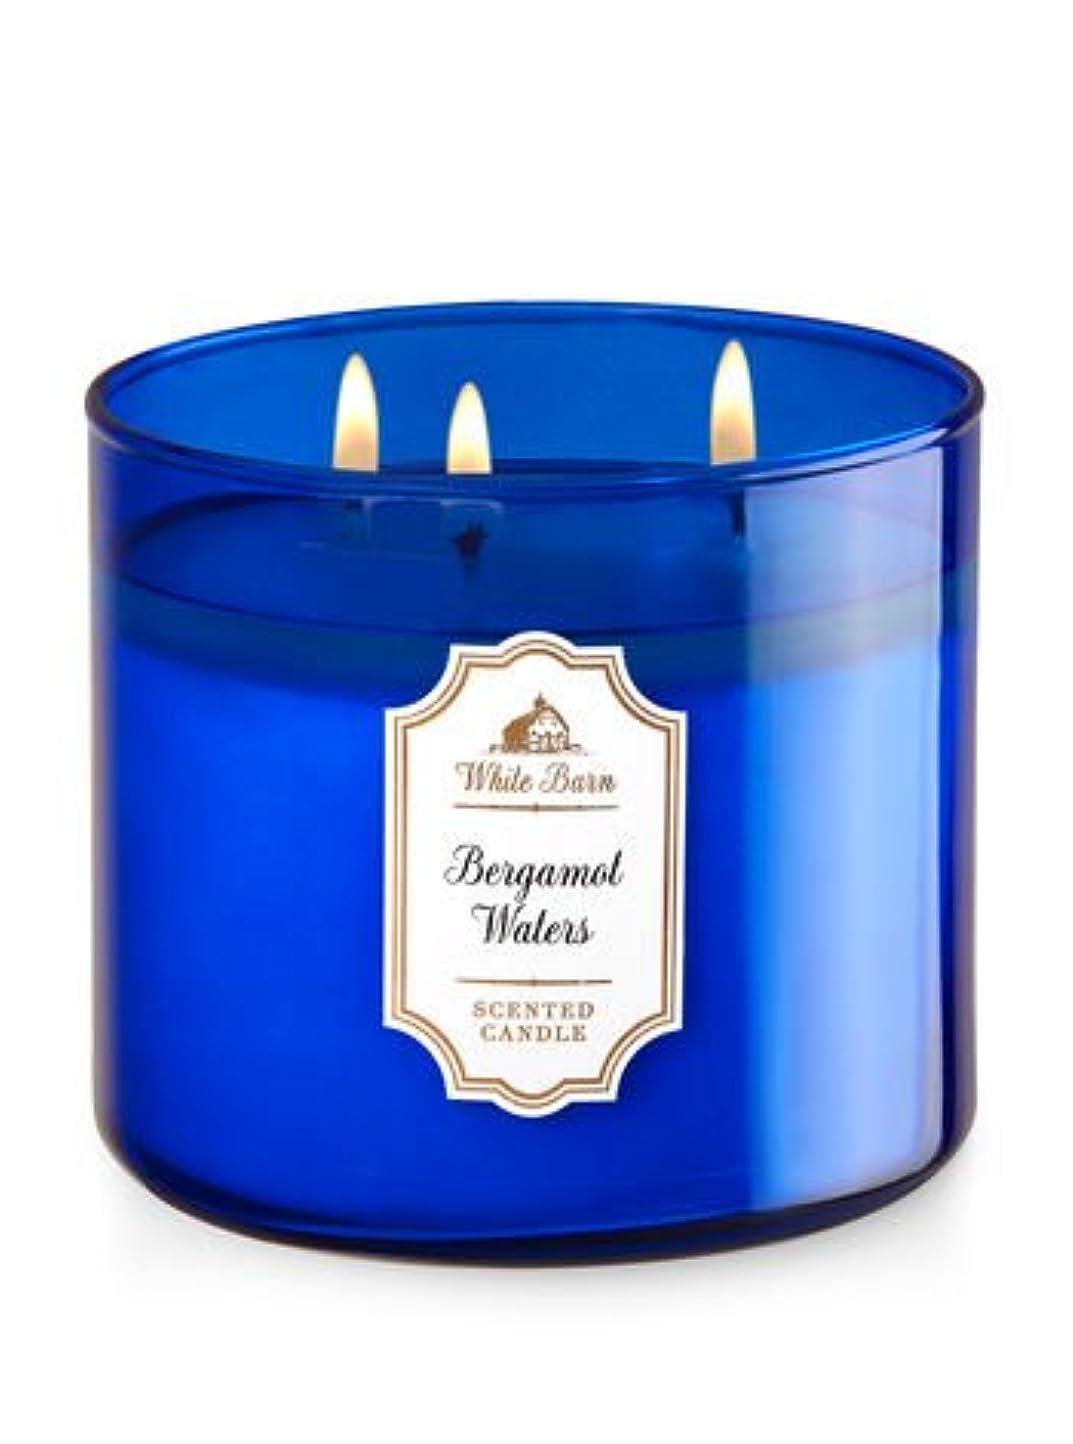 【Bath&Body Works/バス&ボディワークス】 アロマキャンドル ベルガモットウォーター 3-Wick Scented Candle Bergamot Waters 14.5oz/411g [並行輸入品]